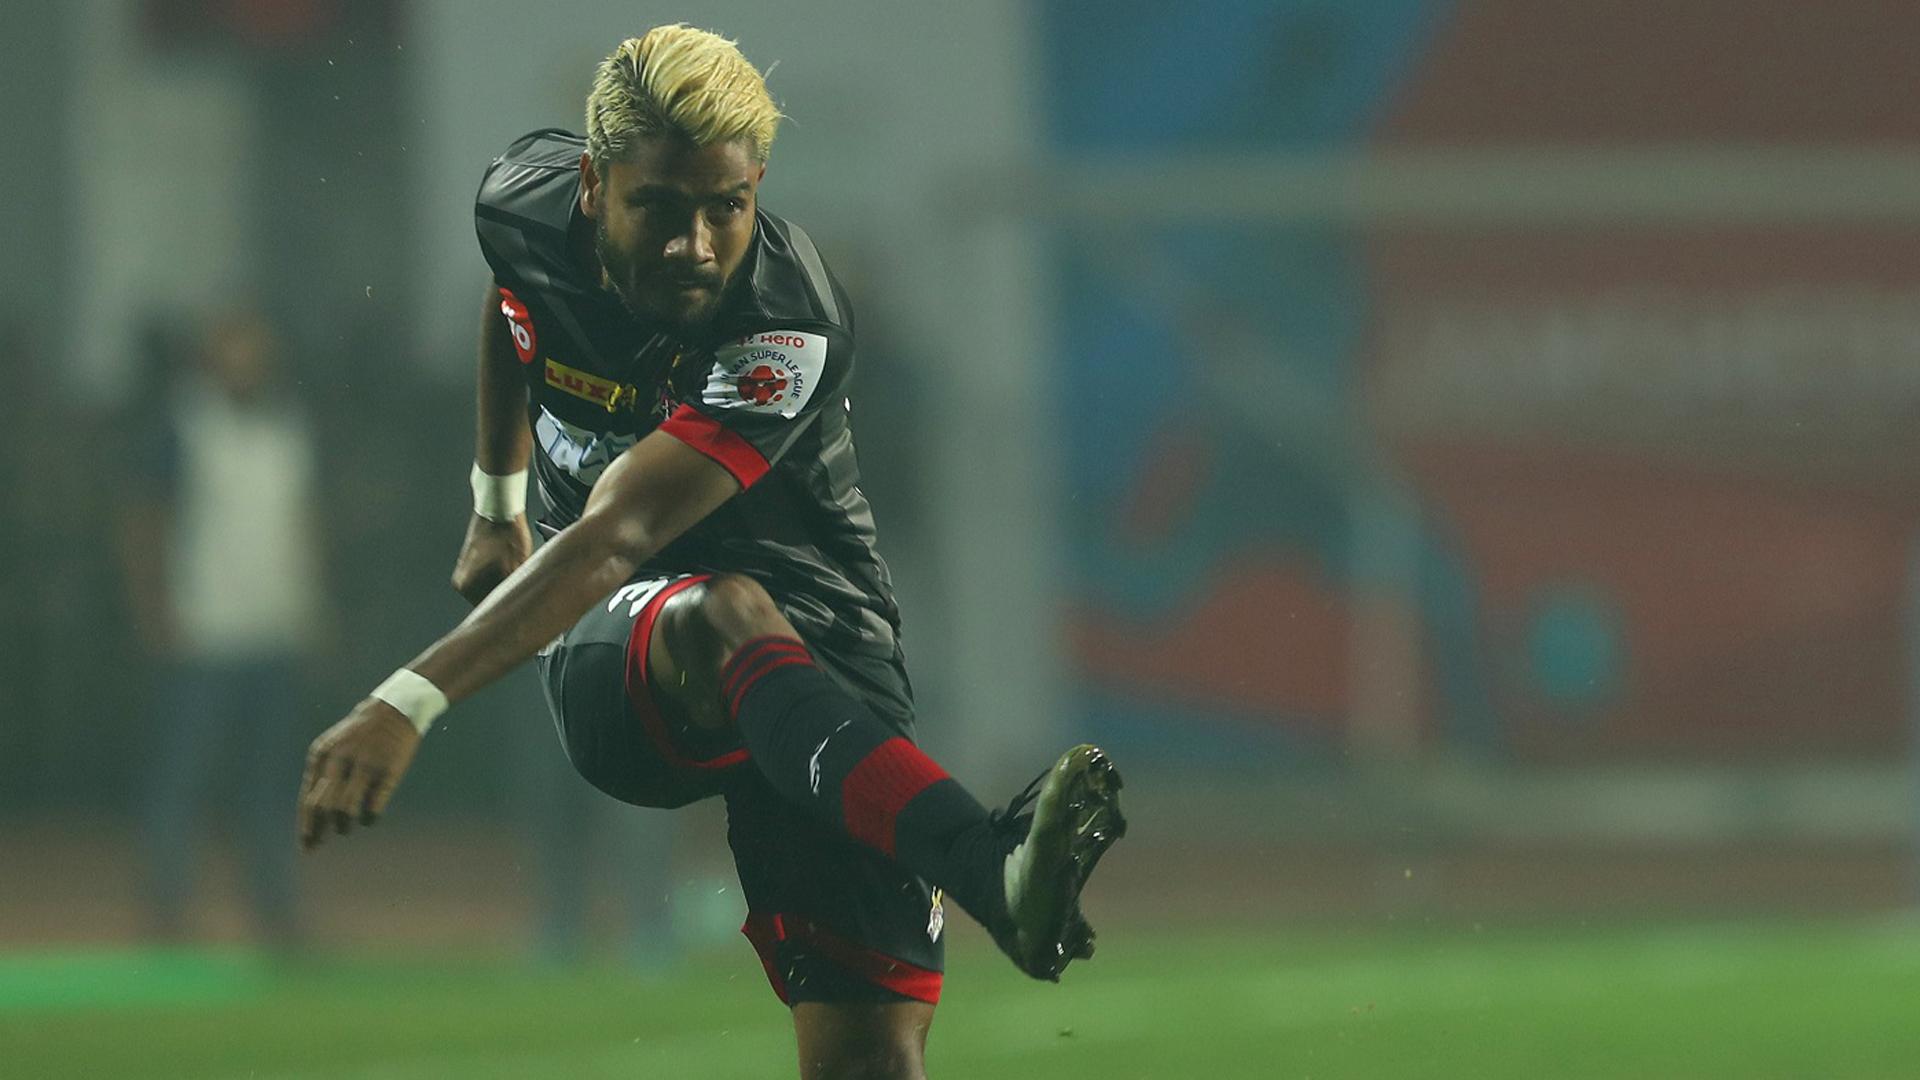 Prabir Das Jamshedpur FC ISL Season 4 2017/2018